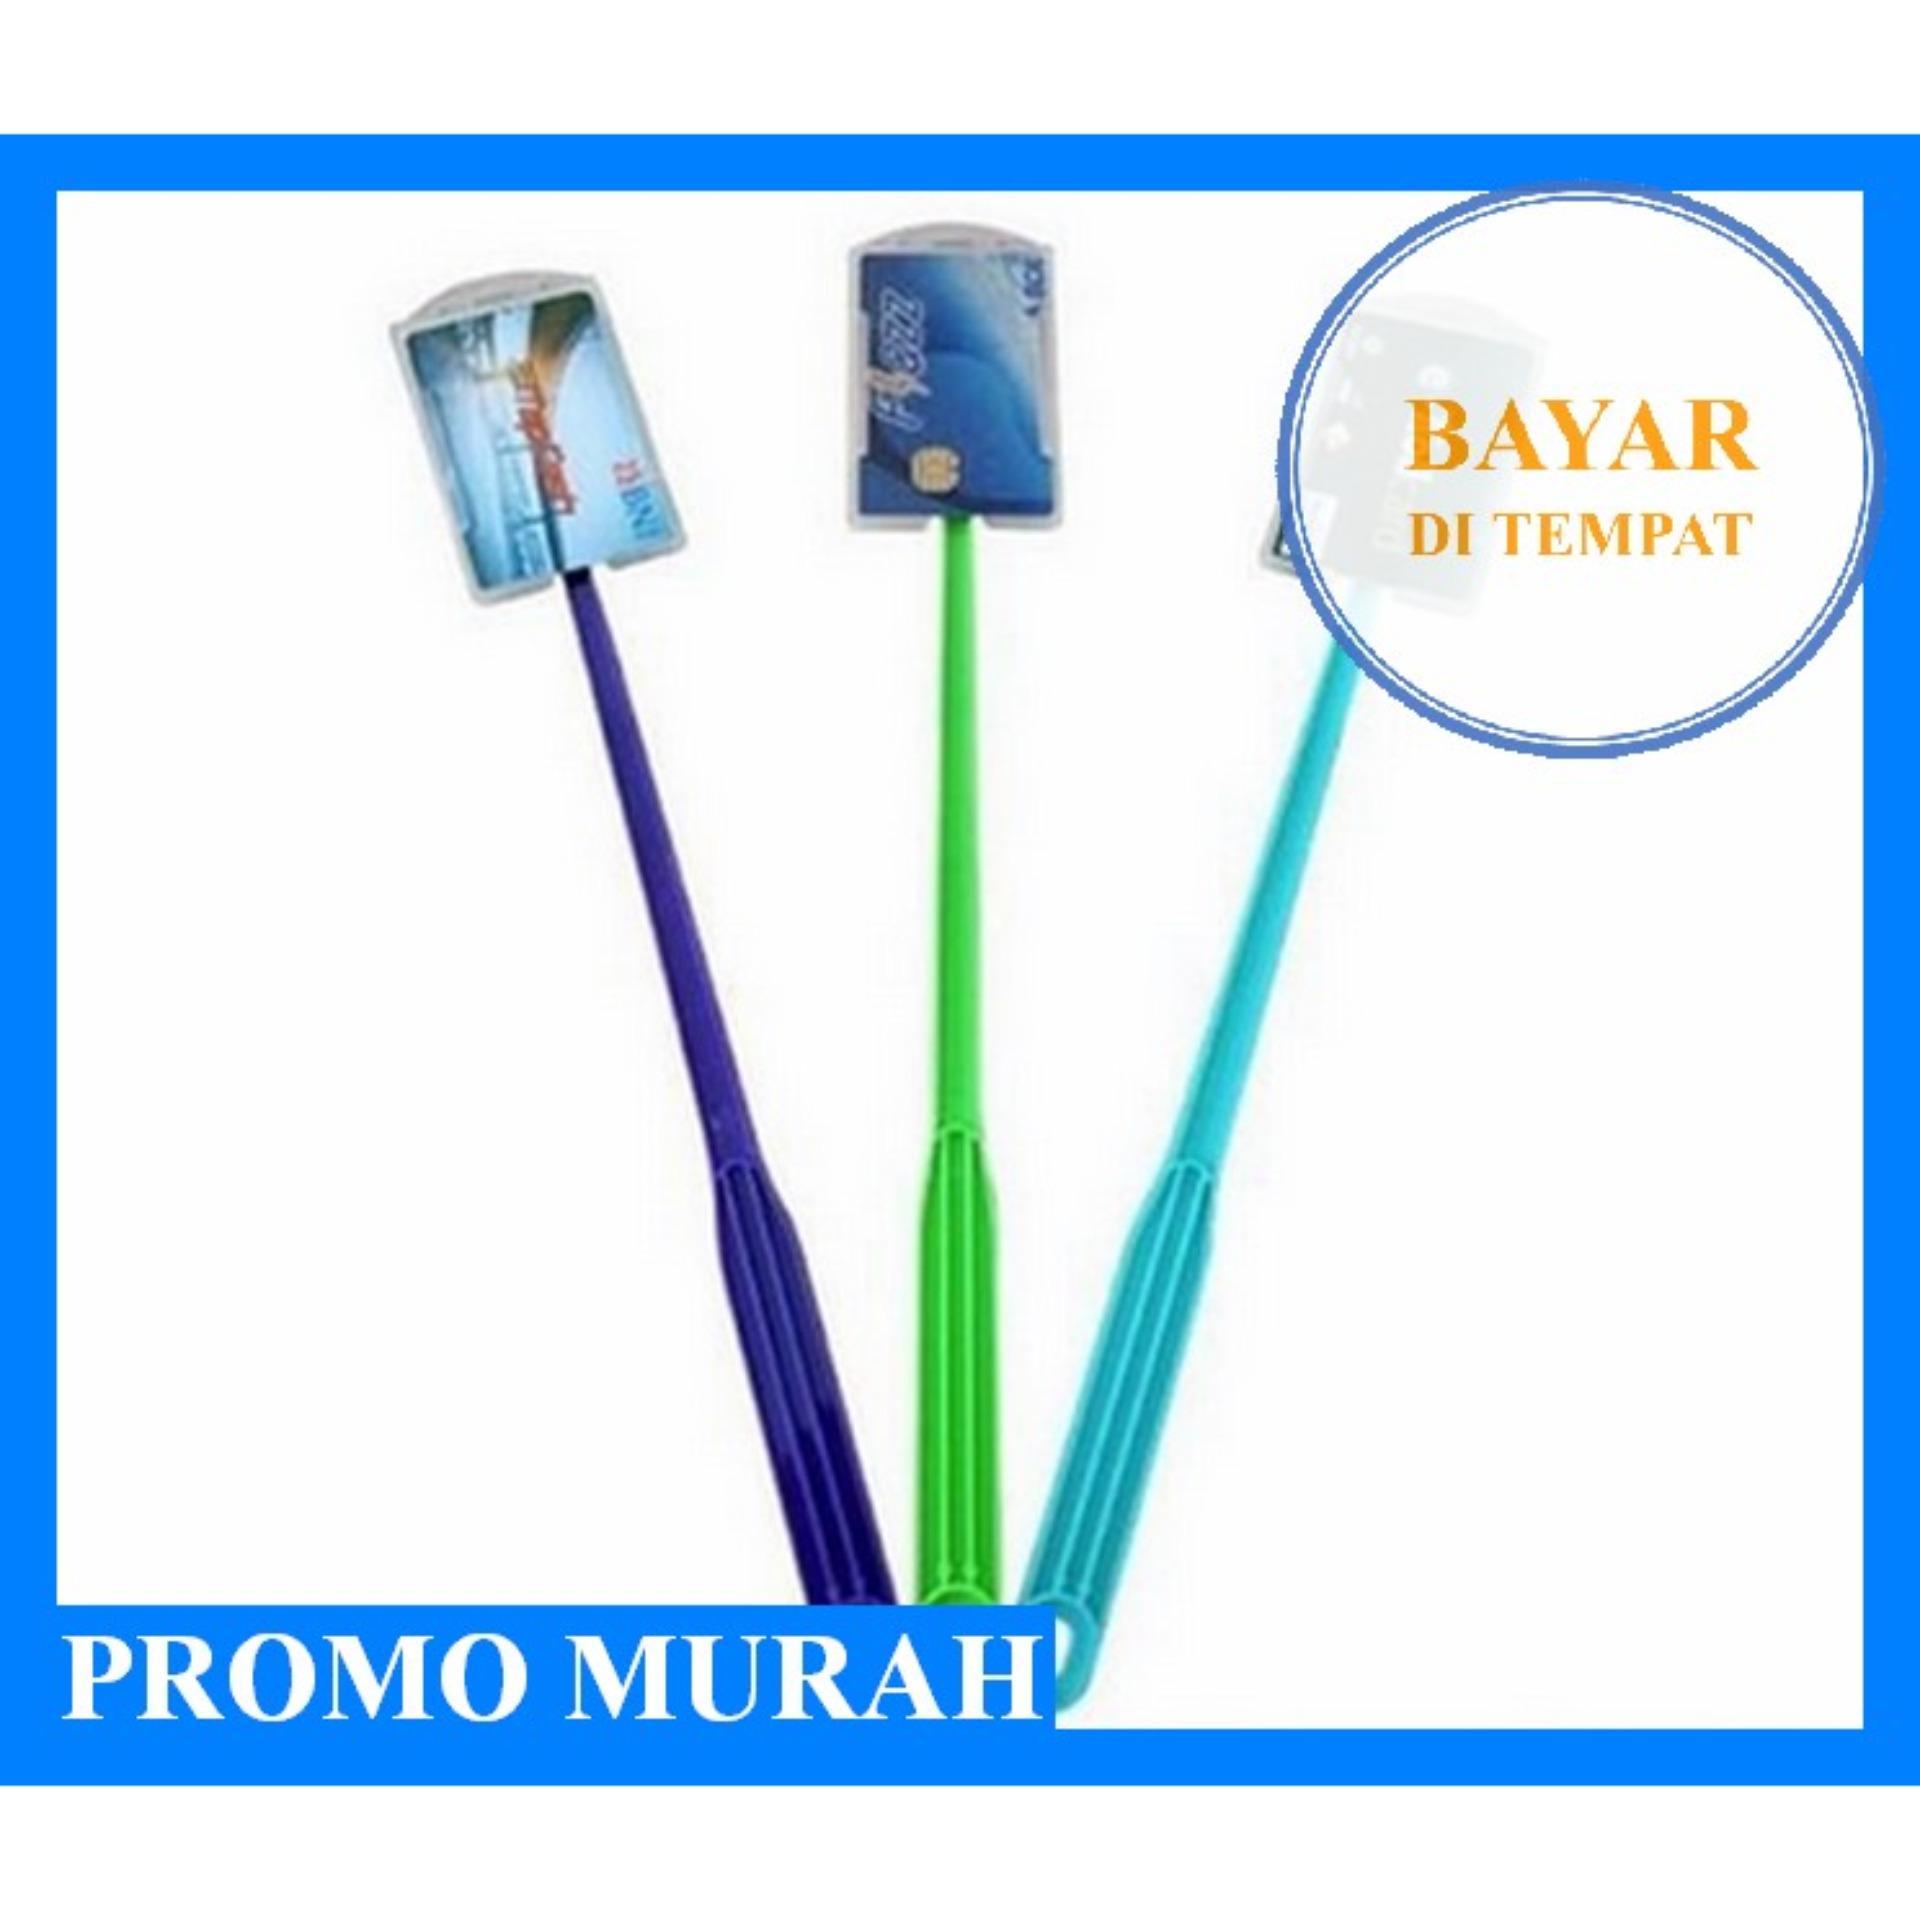 Buy Sell Cheapest Promo E Toll Best Quality Product Deals Emoney Mandiri Custom Gratis Tongtol Murah Tongkat Money Stik Tol